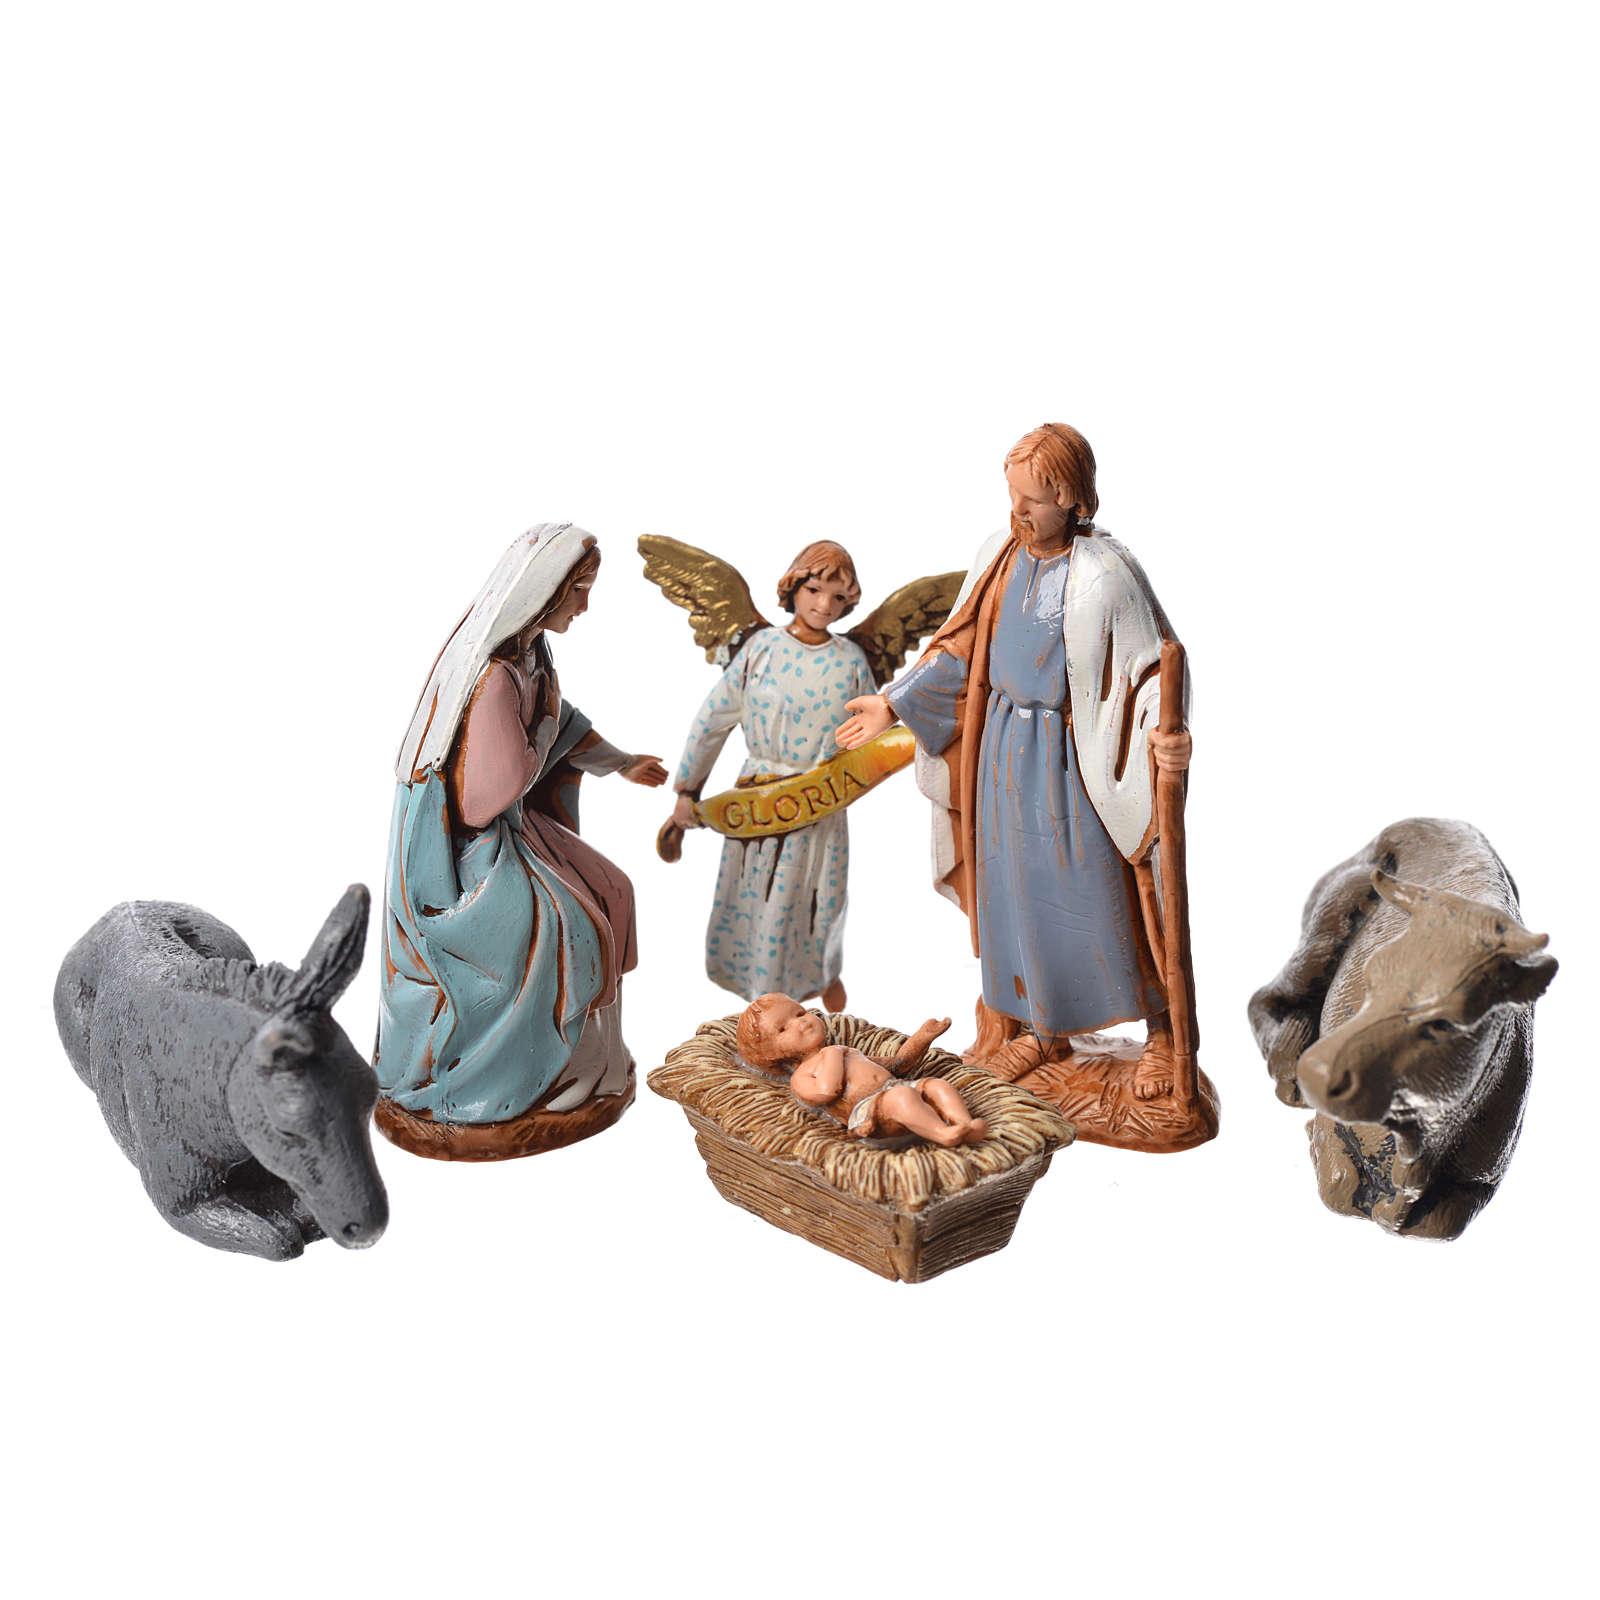 Crèche Moranduzzo 6,5cm, lot de 6 santons 4